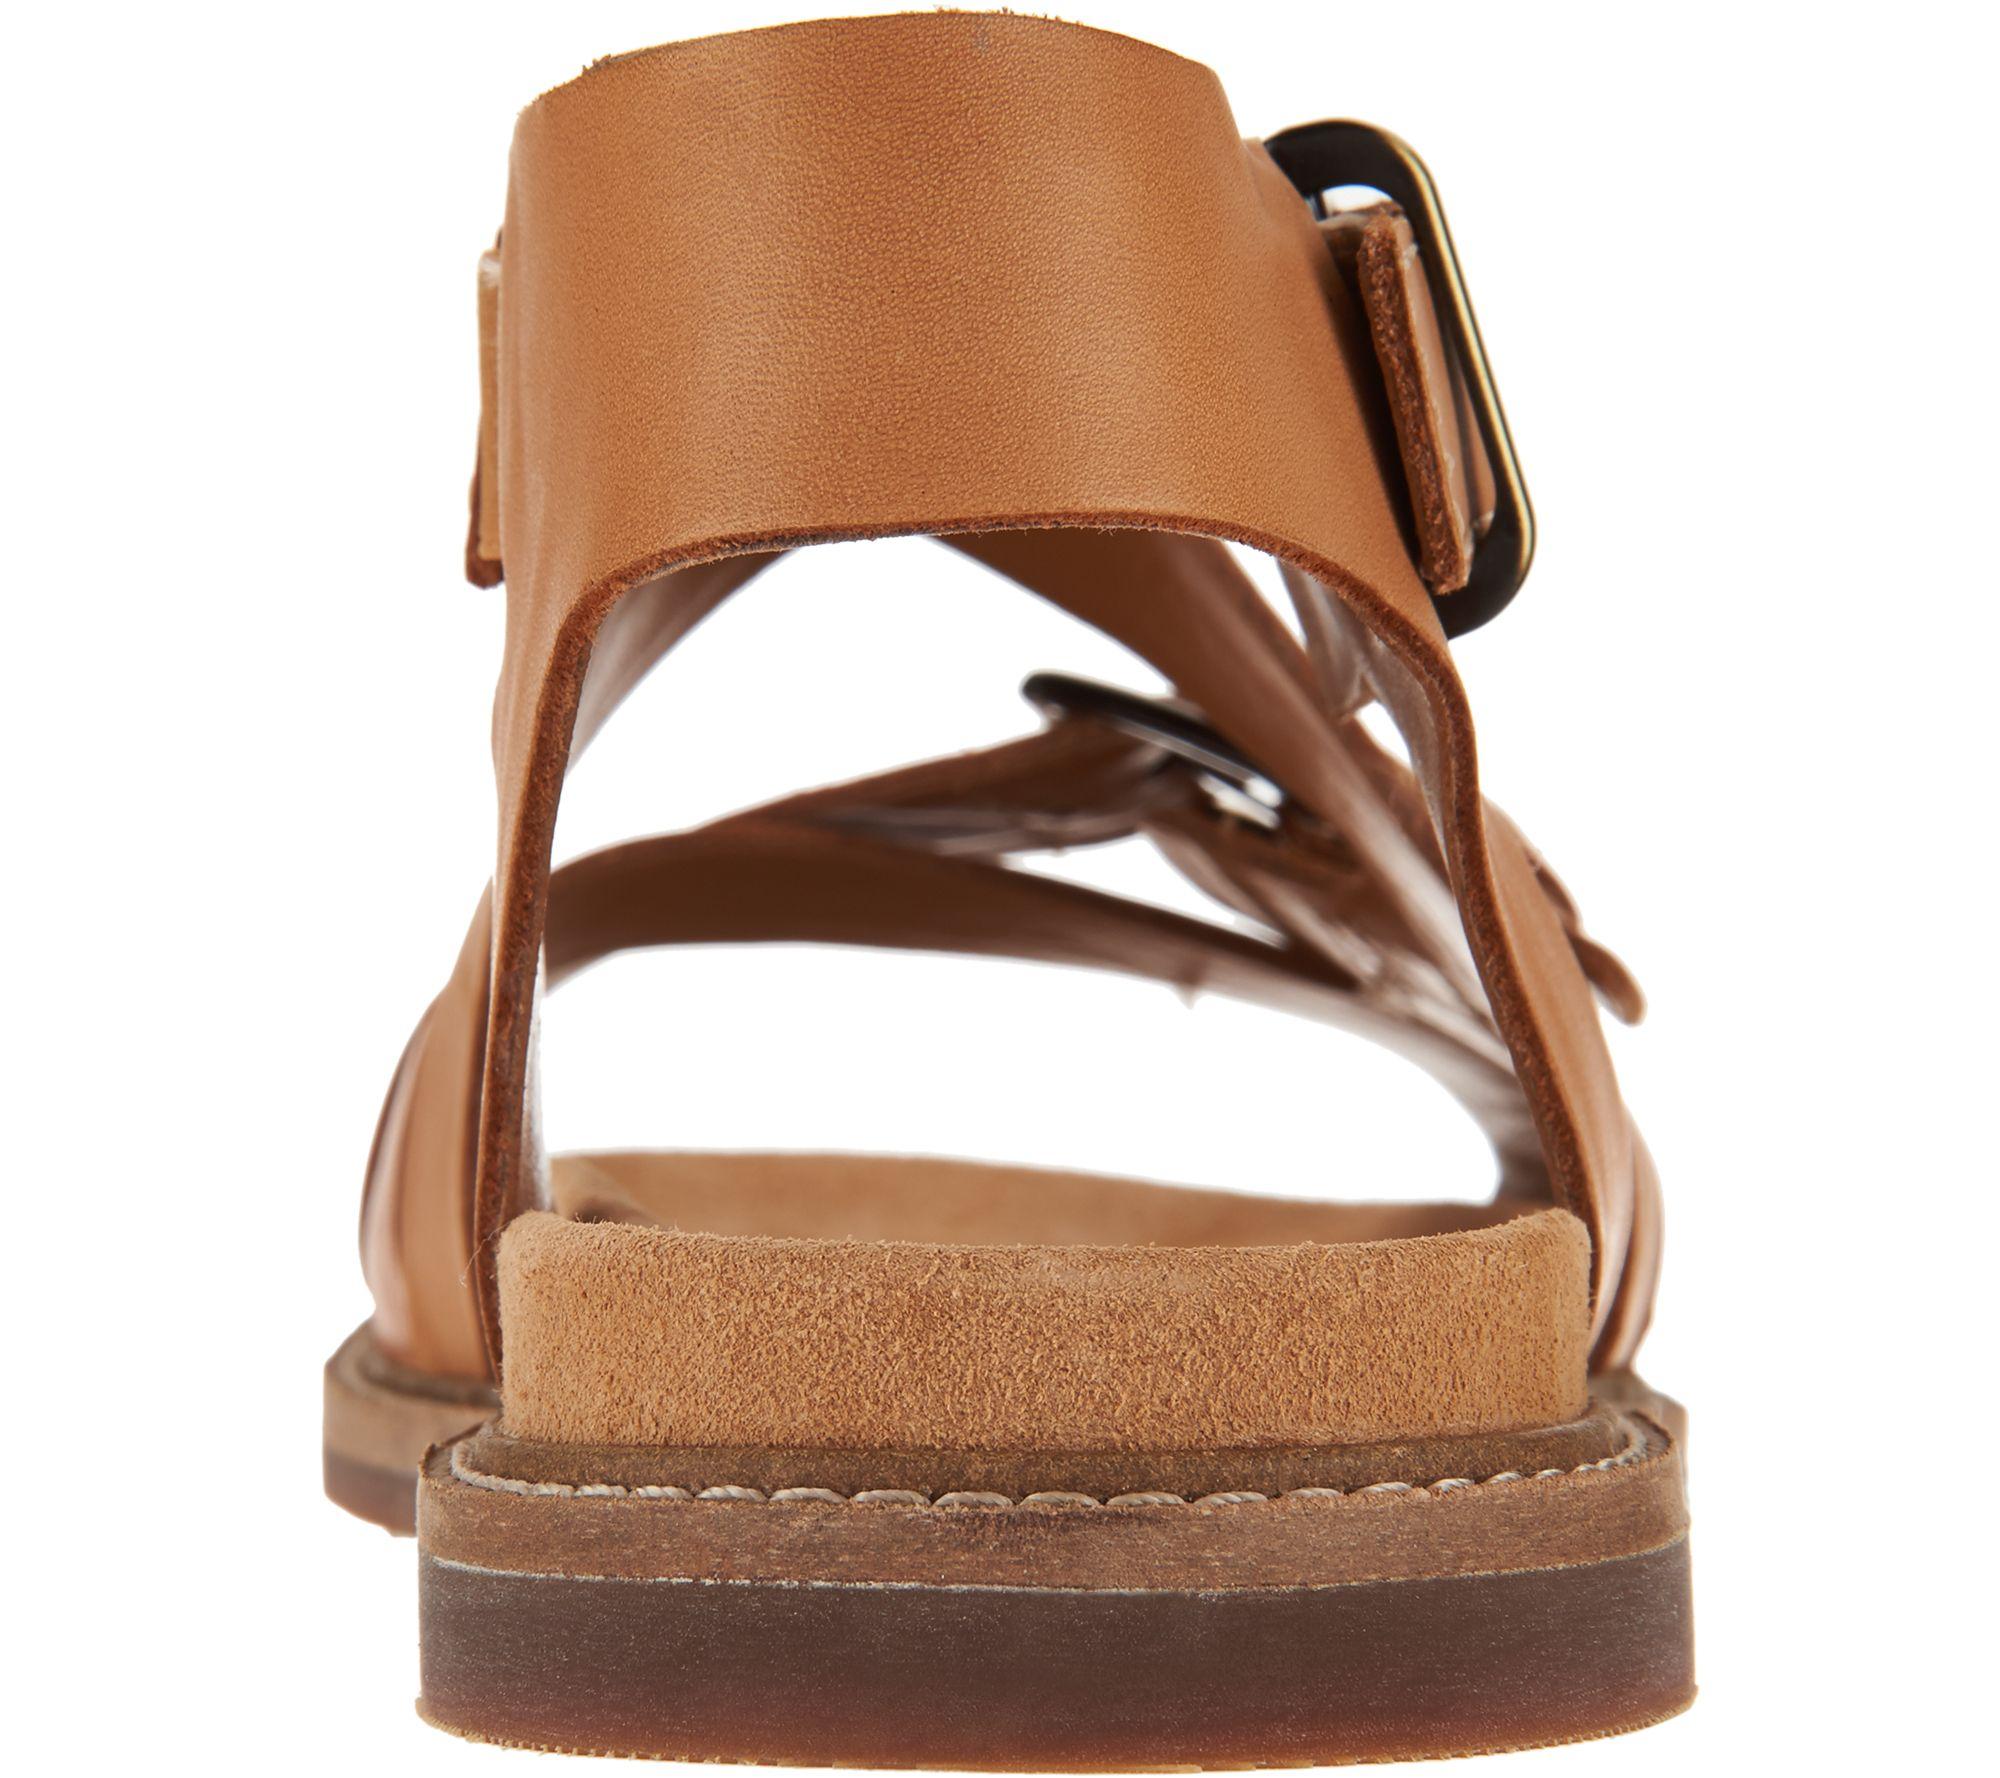 7e146a7ddab Clarks Artisan Leather Criss Cross Sandals - Corsio Bambi - Page 1 — QVC.com